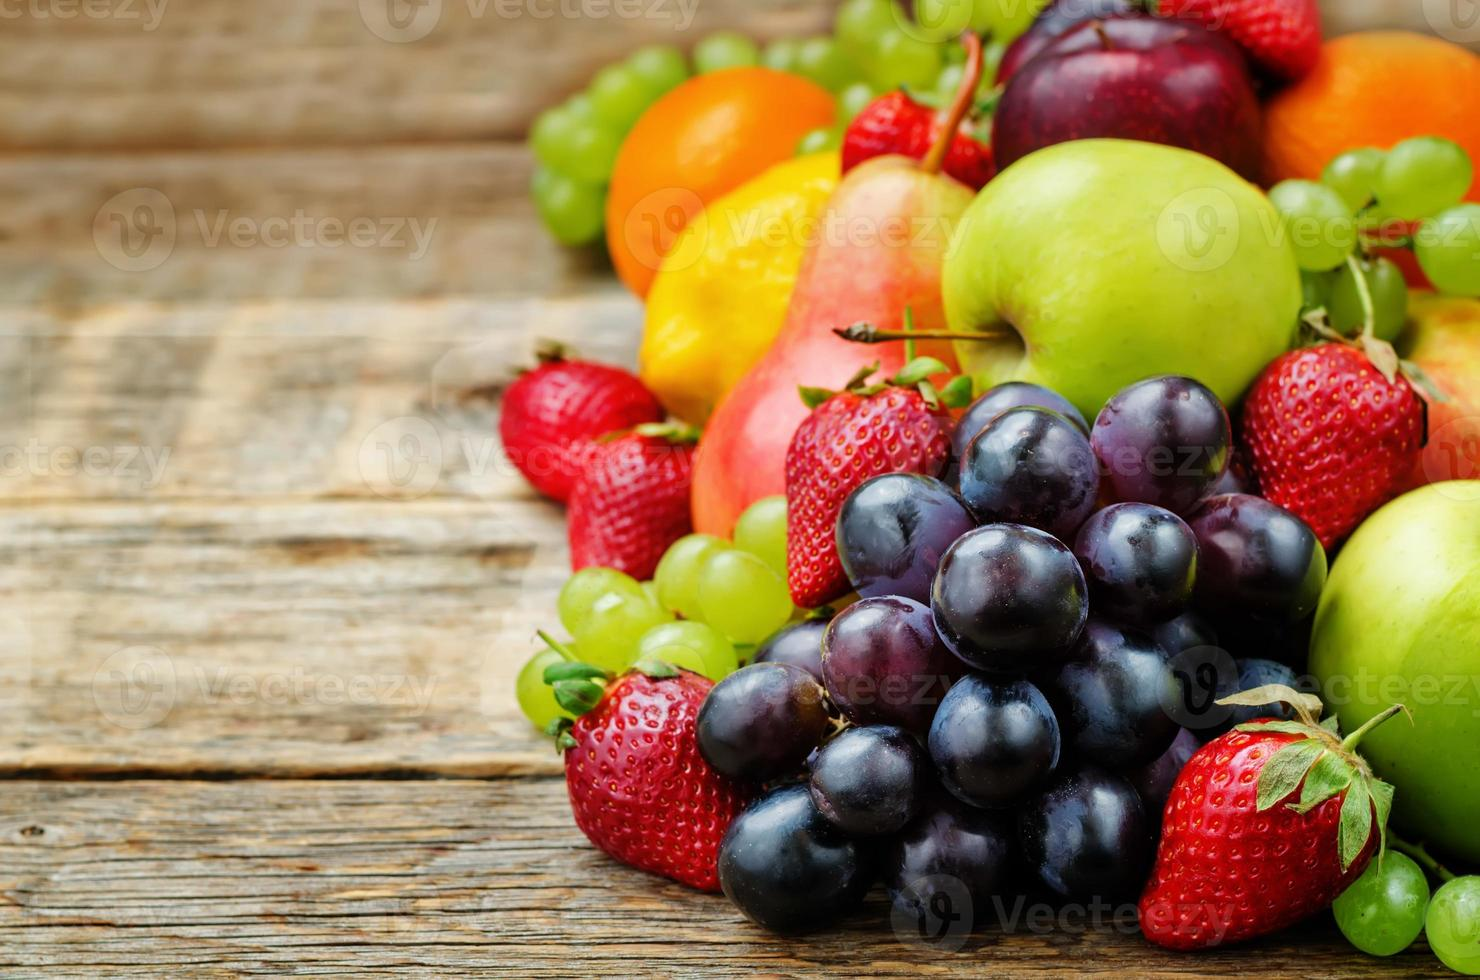 frutta. mango, limone, prugna, uva, pera, arancia, mela, banana, fragola foto